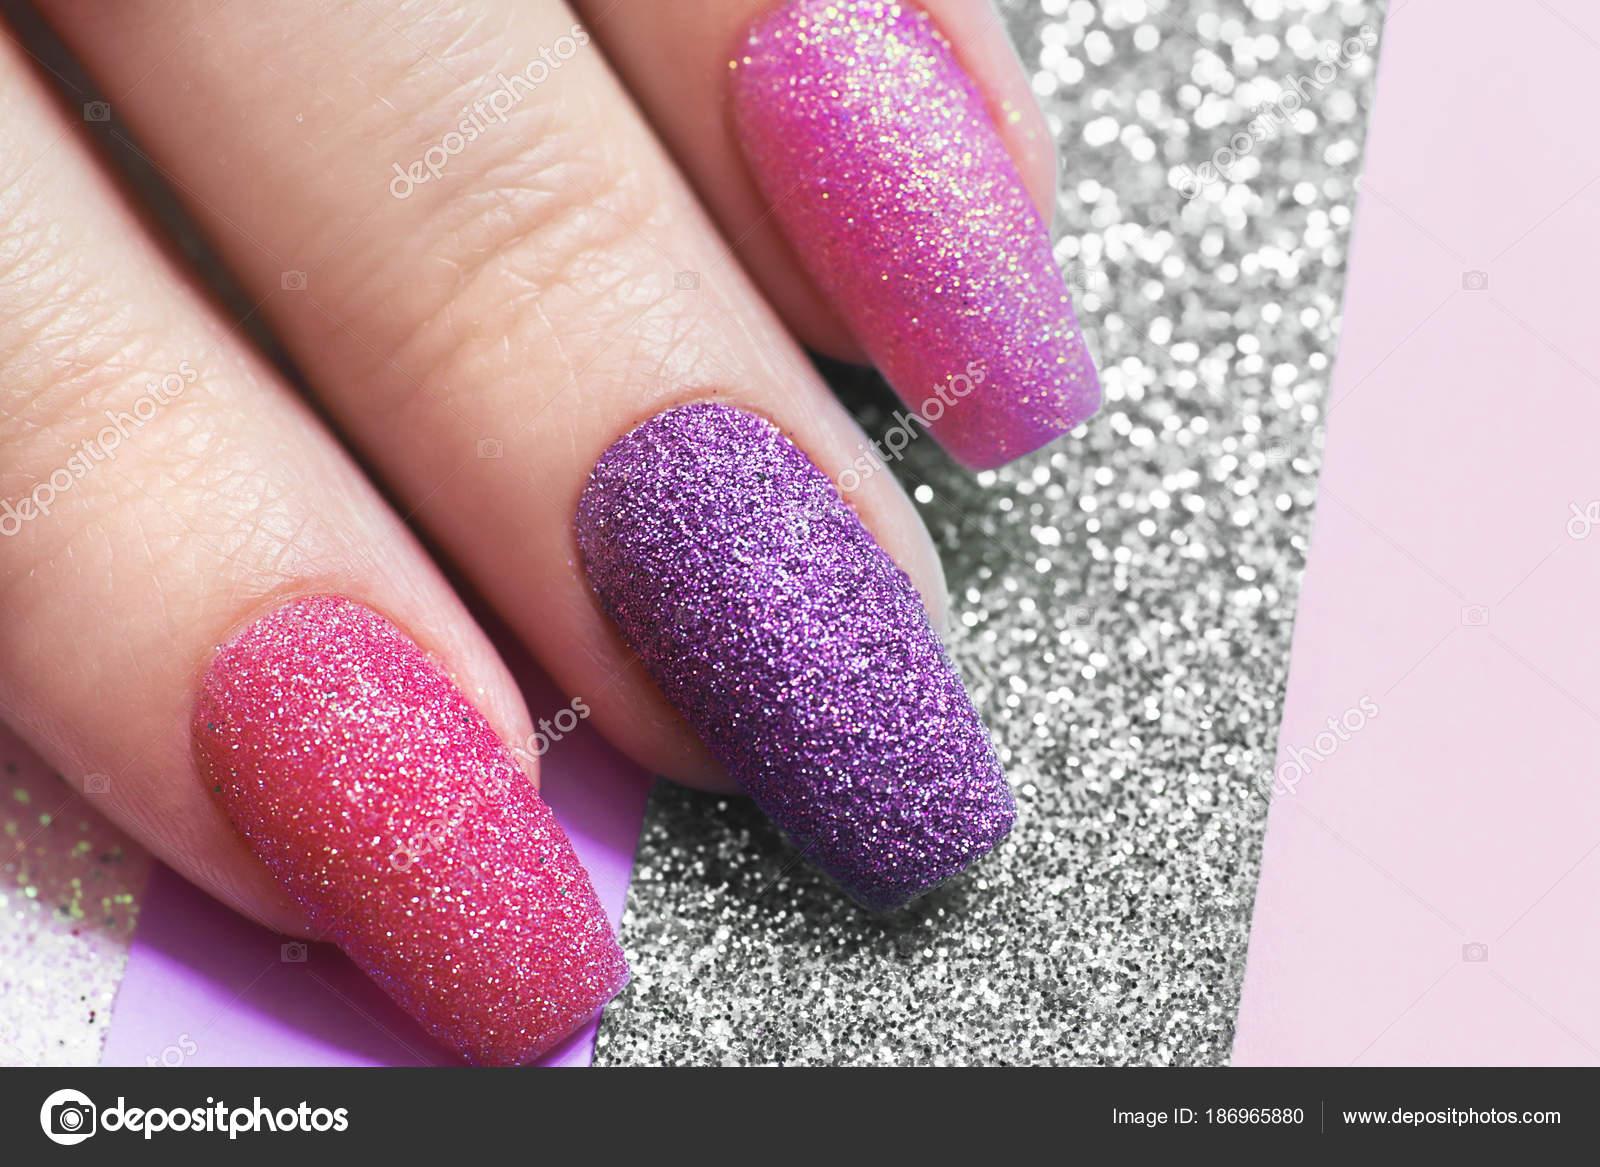 Design Long Nails Multicolored Sequin Closeup Nail Art Stock Photo